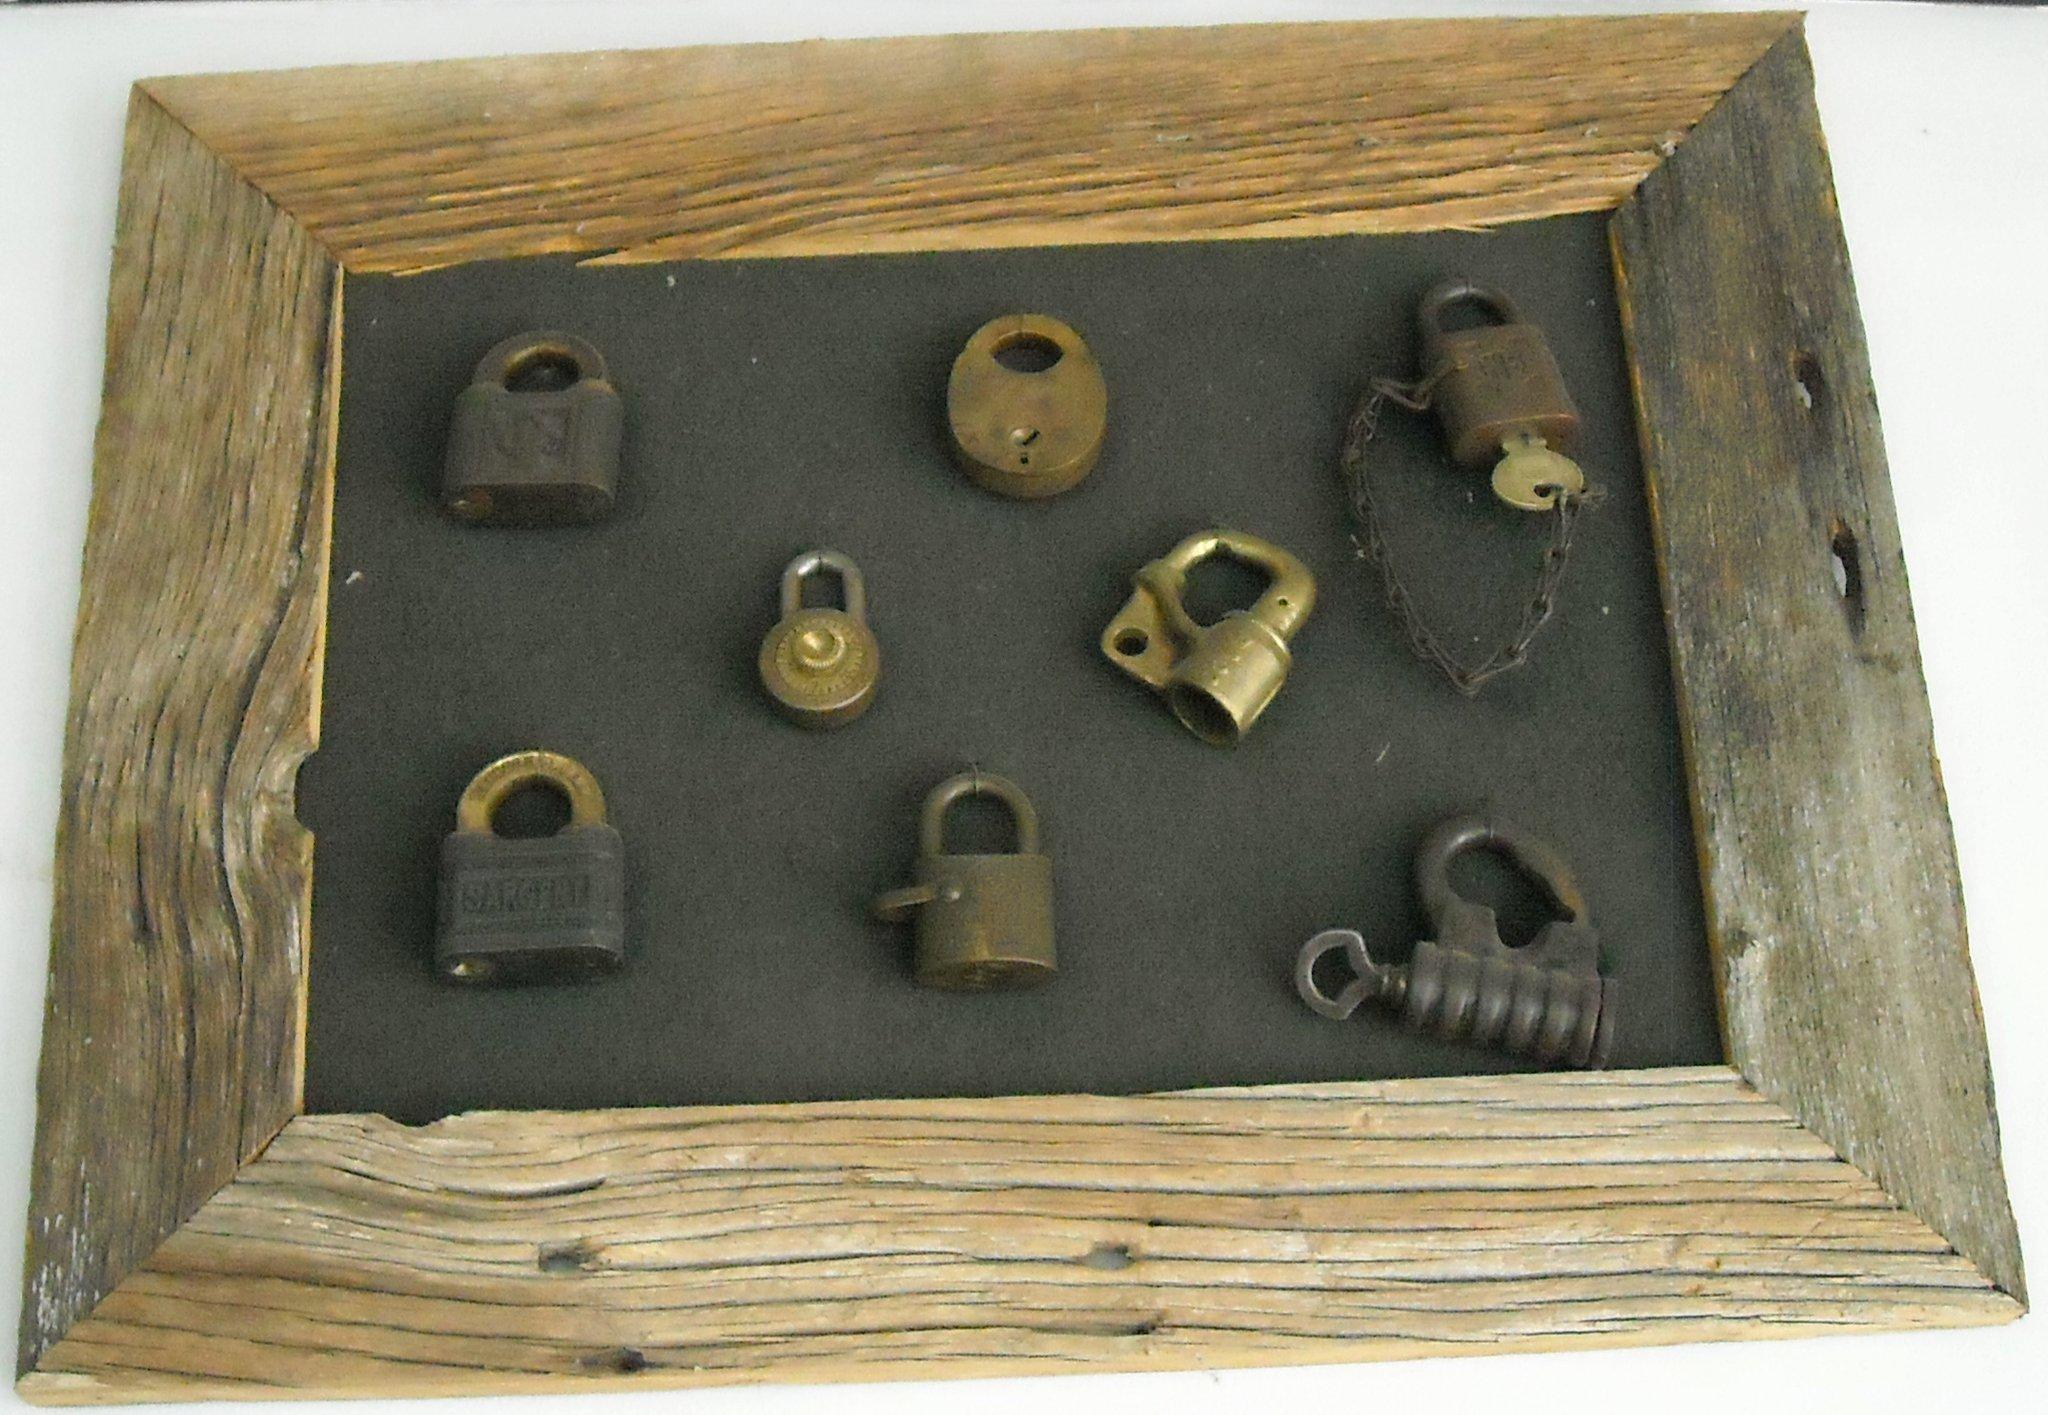 Cuyahoga Safe & Lock